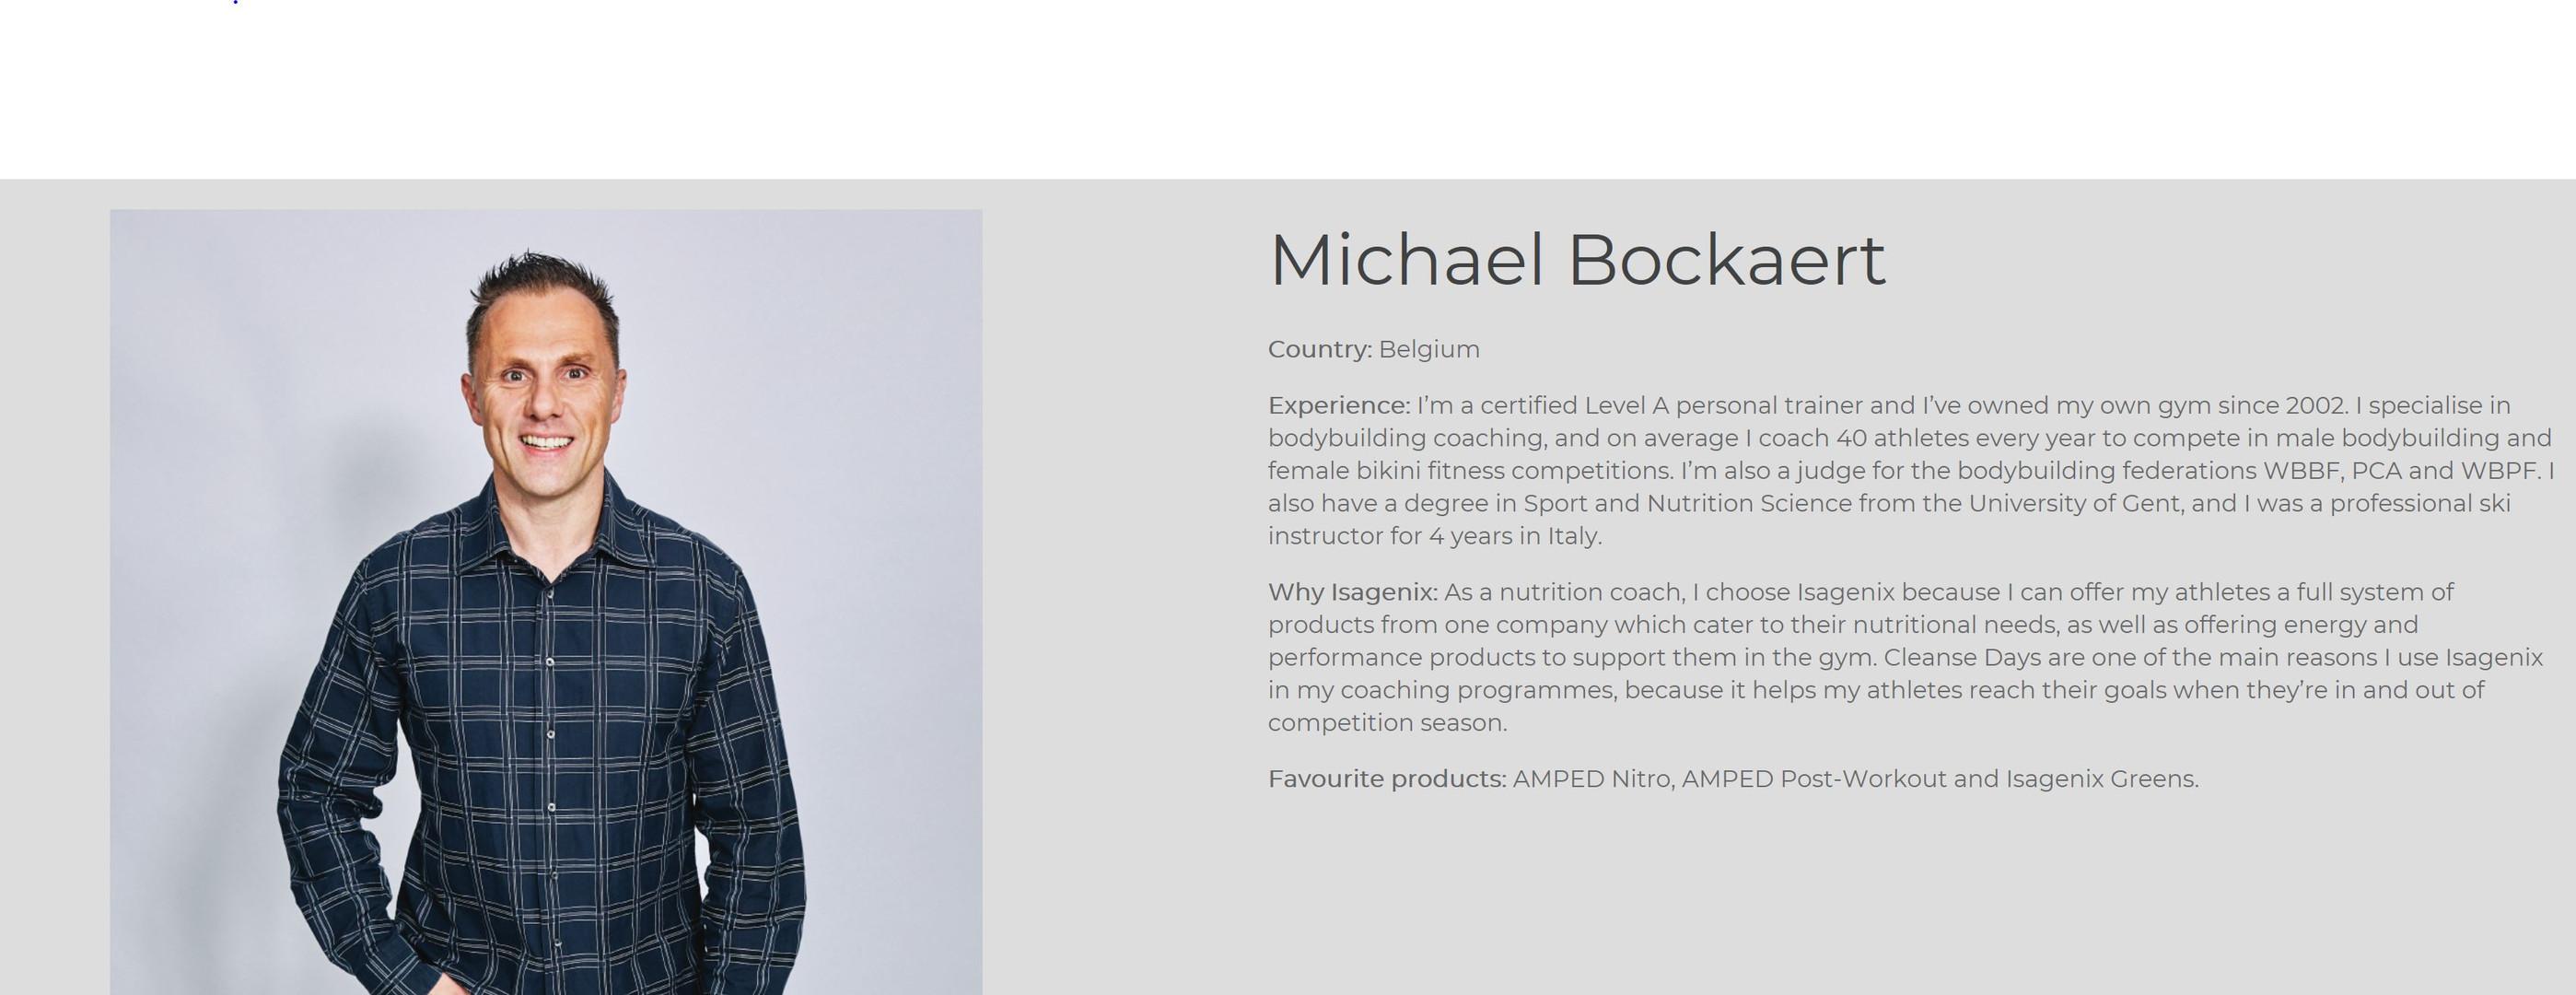 Michael Bockaert